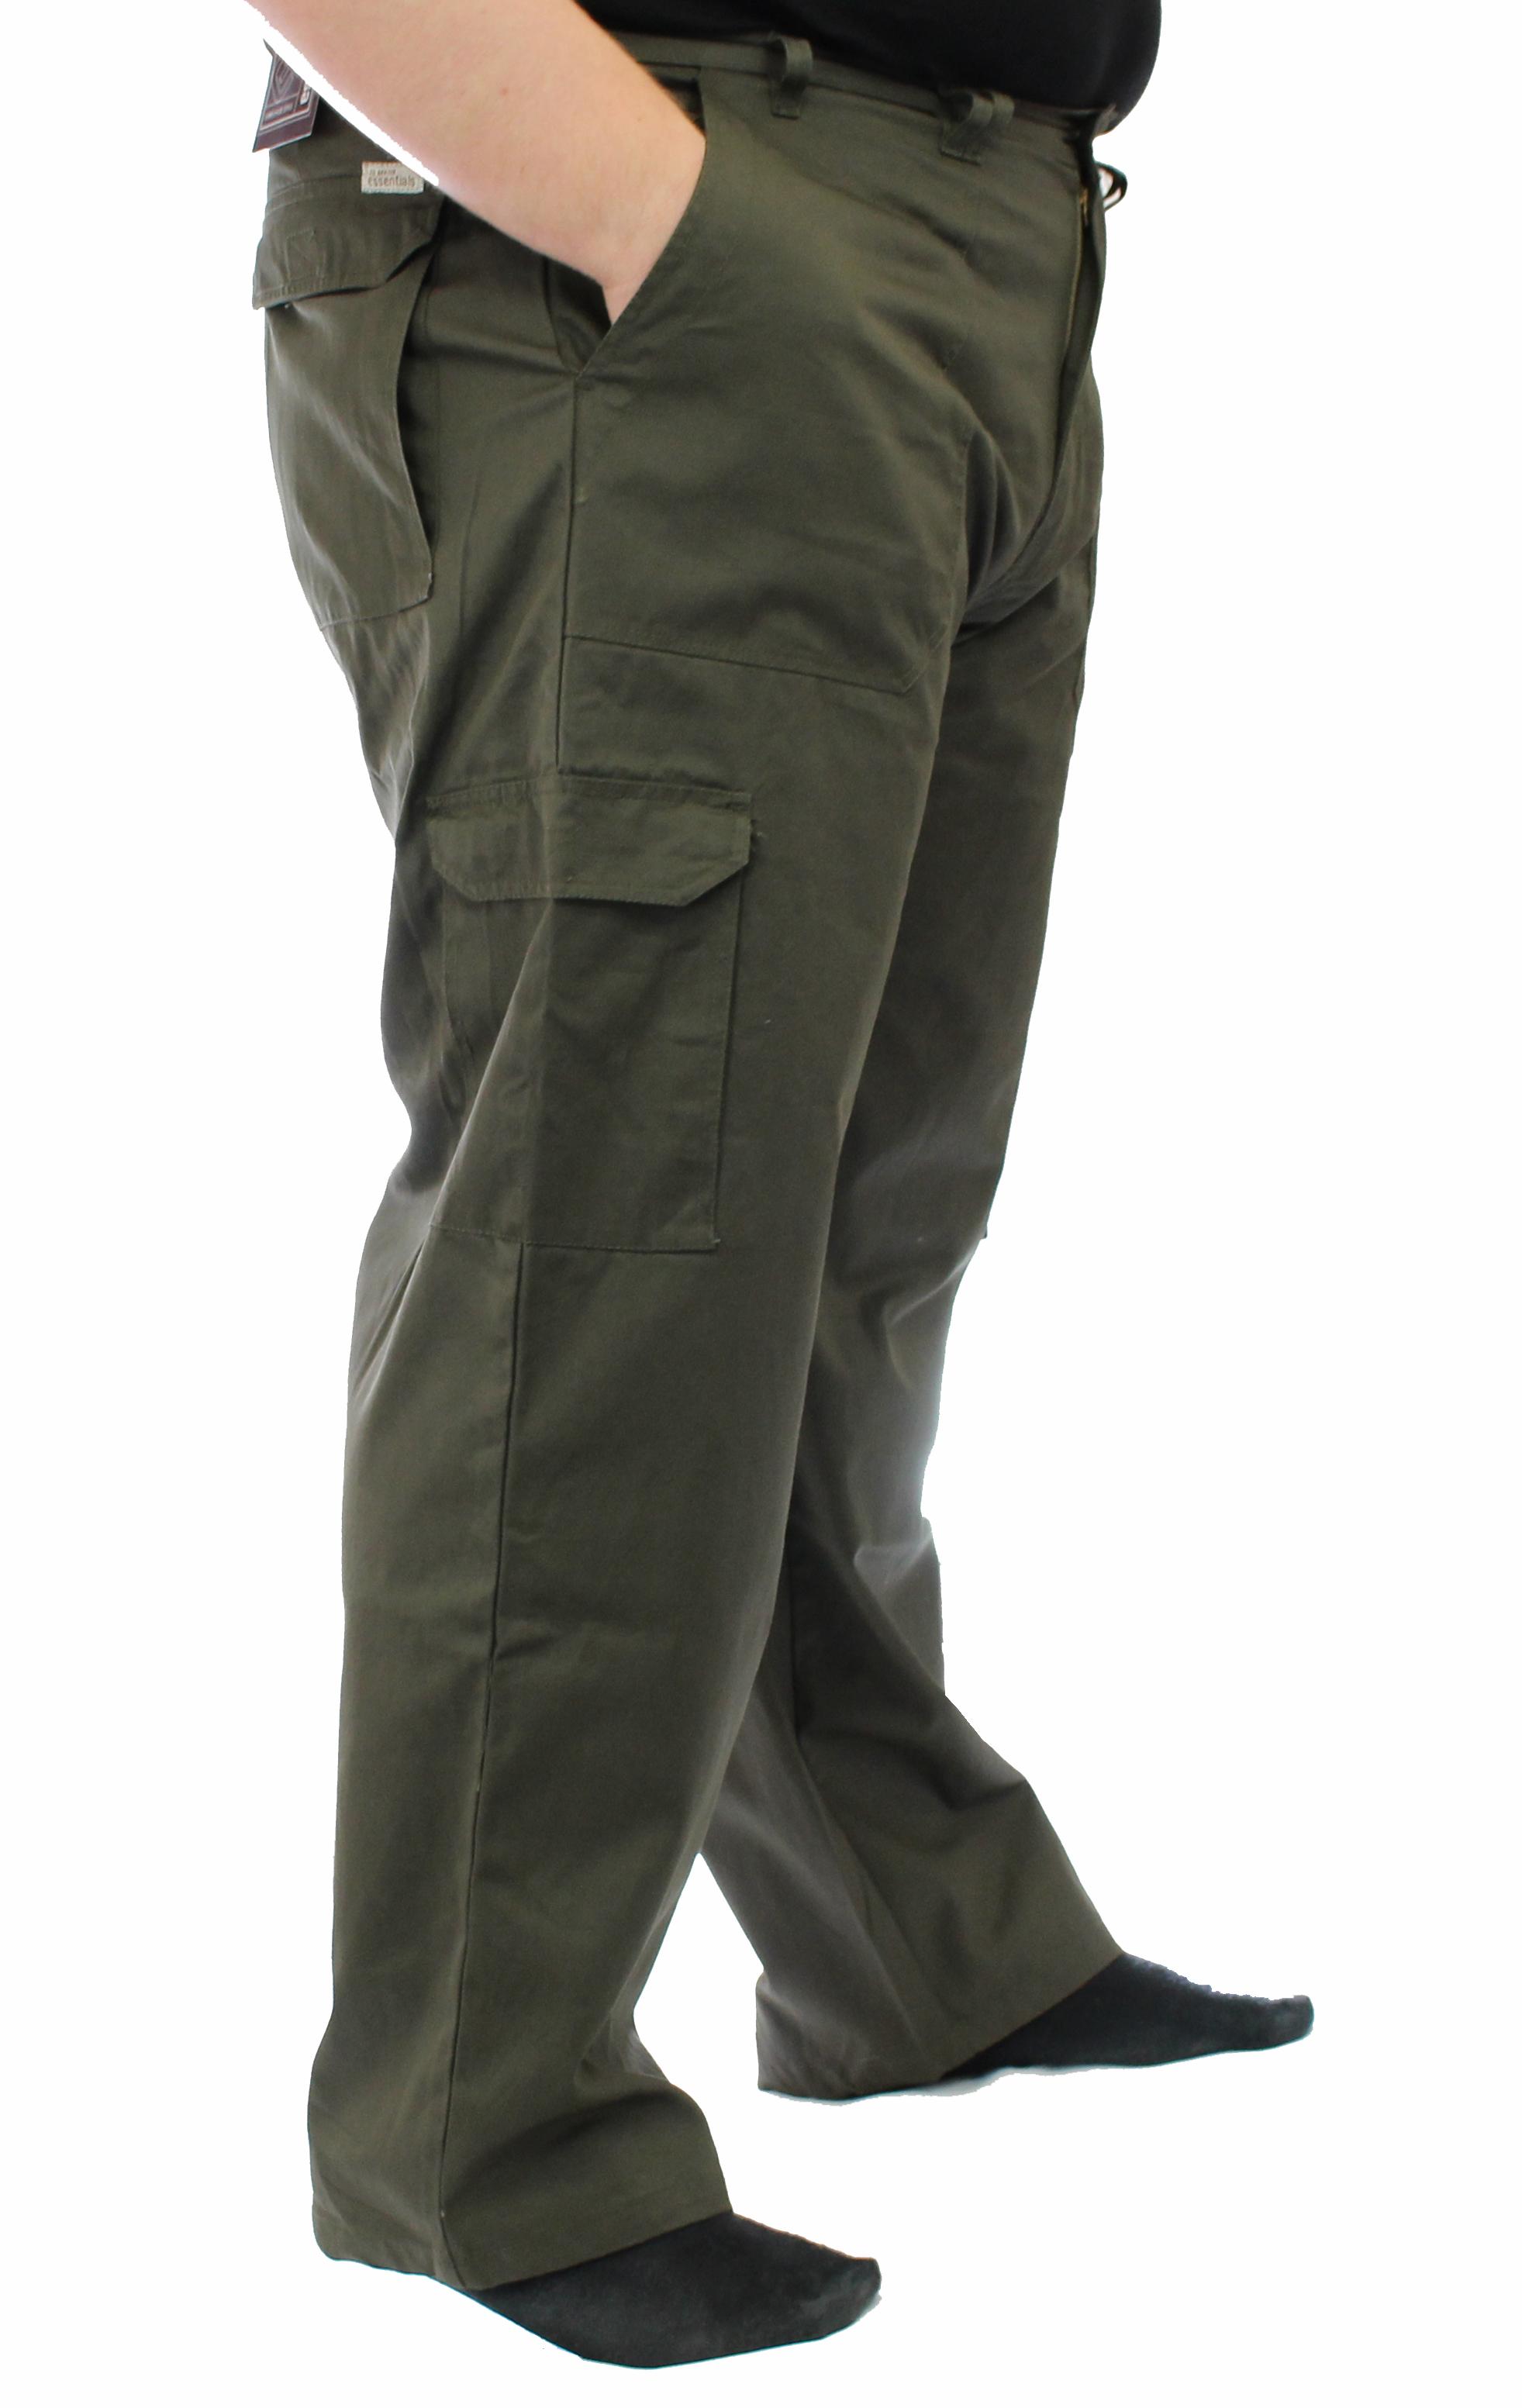 "Ed Baxter Victory - Heavy Duty Cargo Combat Trousers - Khaki - 64"" Waist, 30"" Leg"